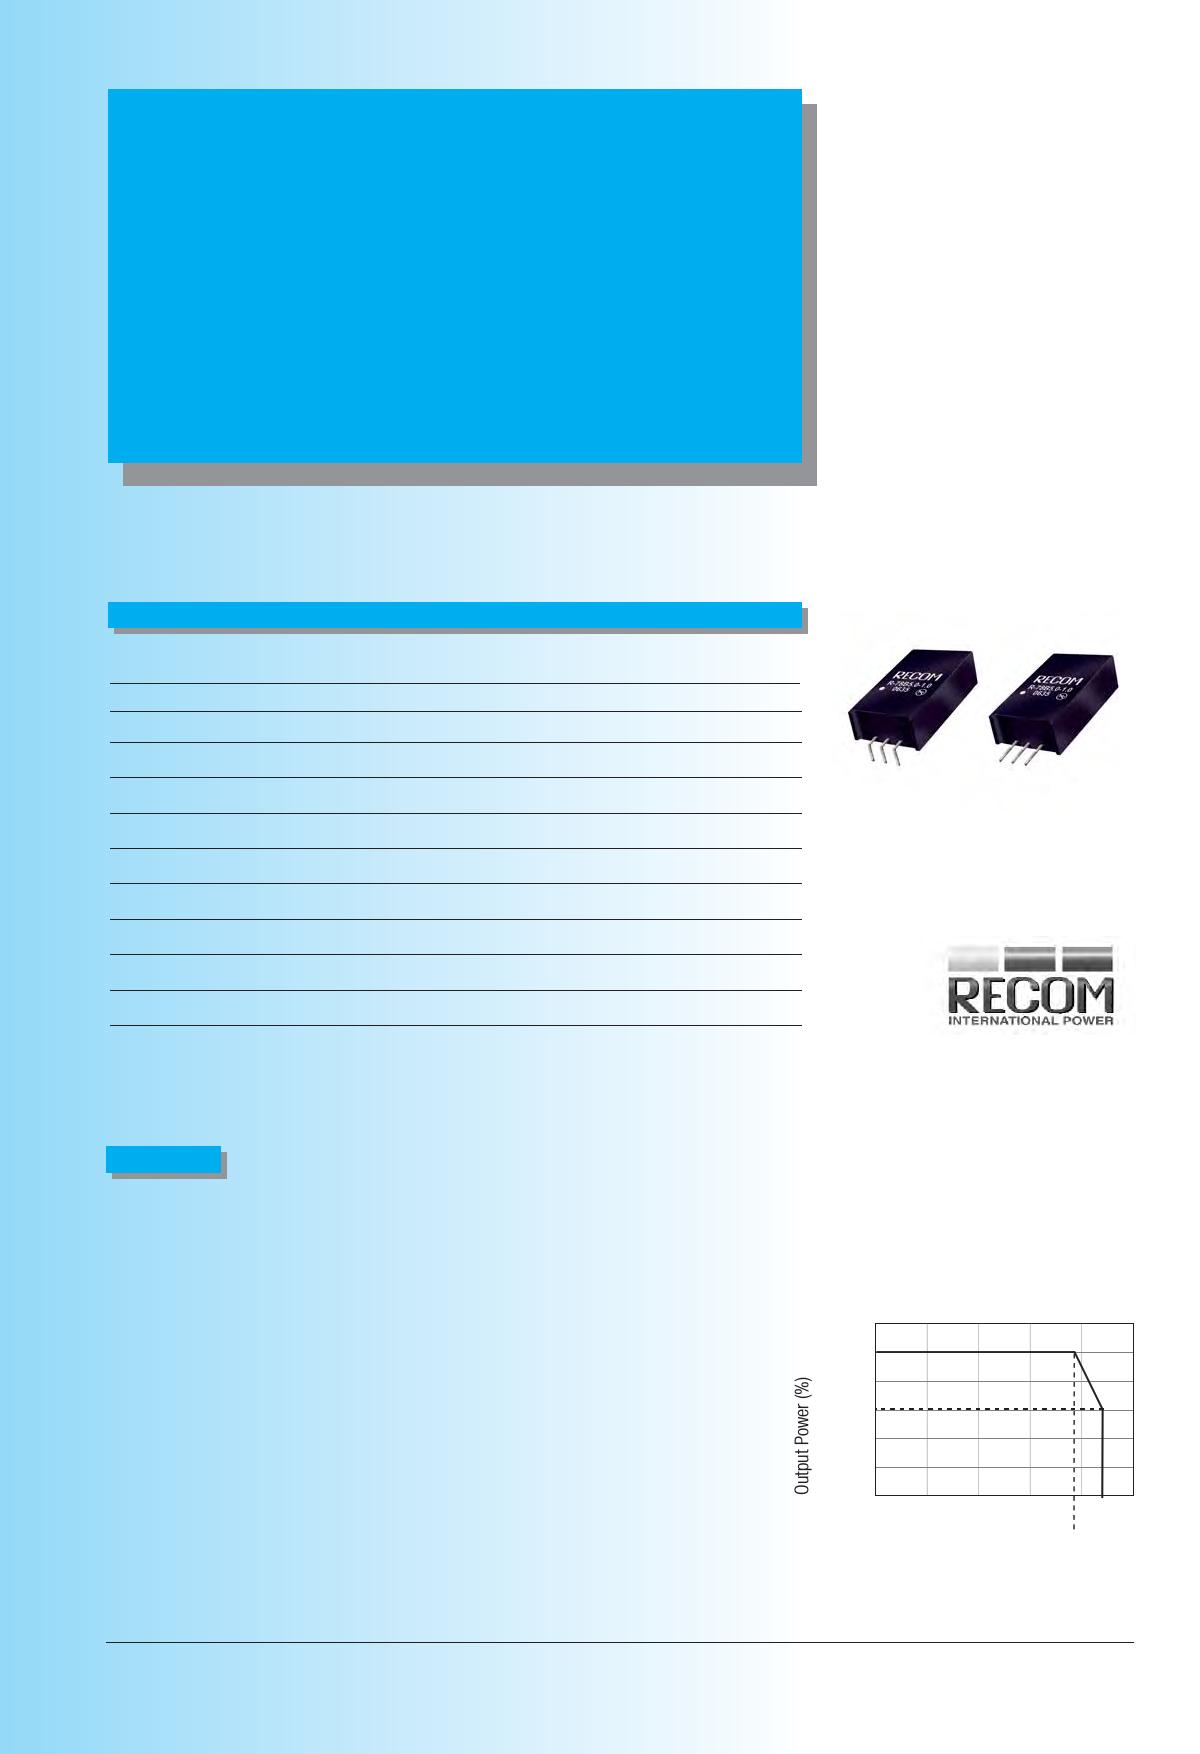 R-78Bxx-1.0L datasheet